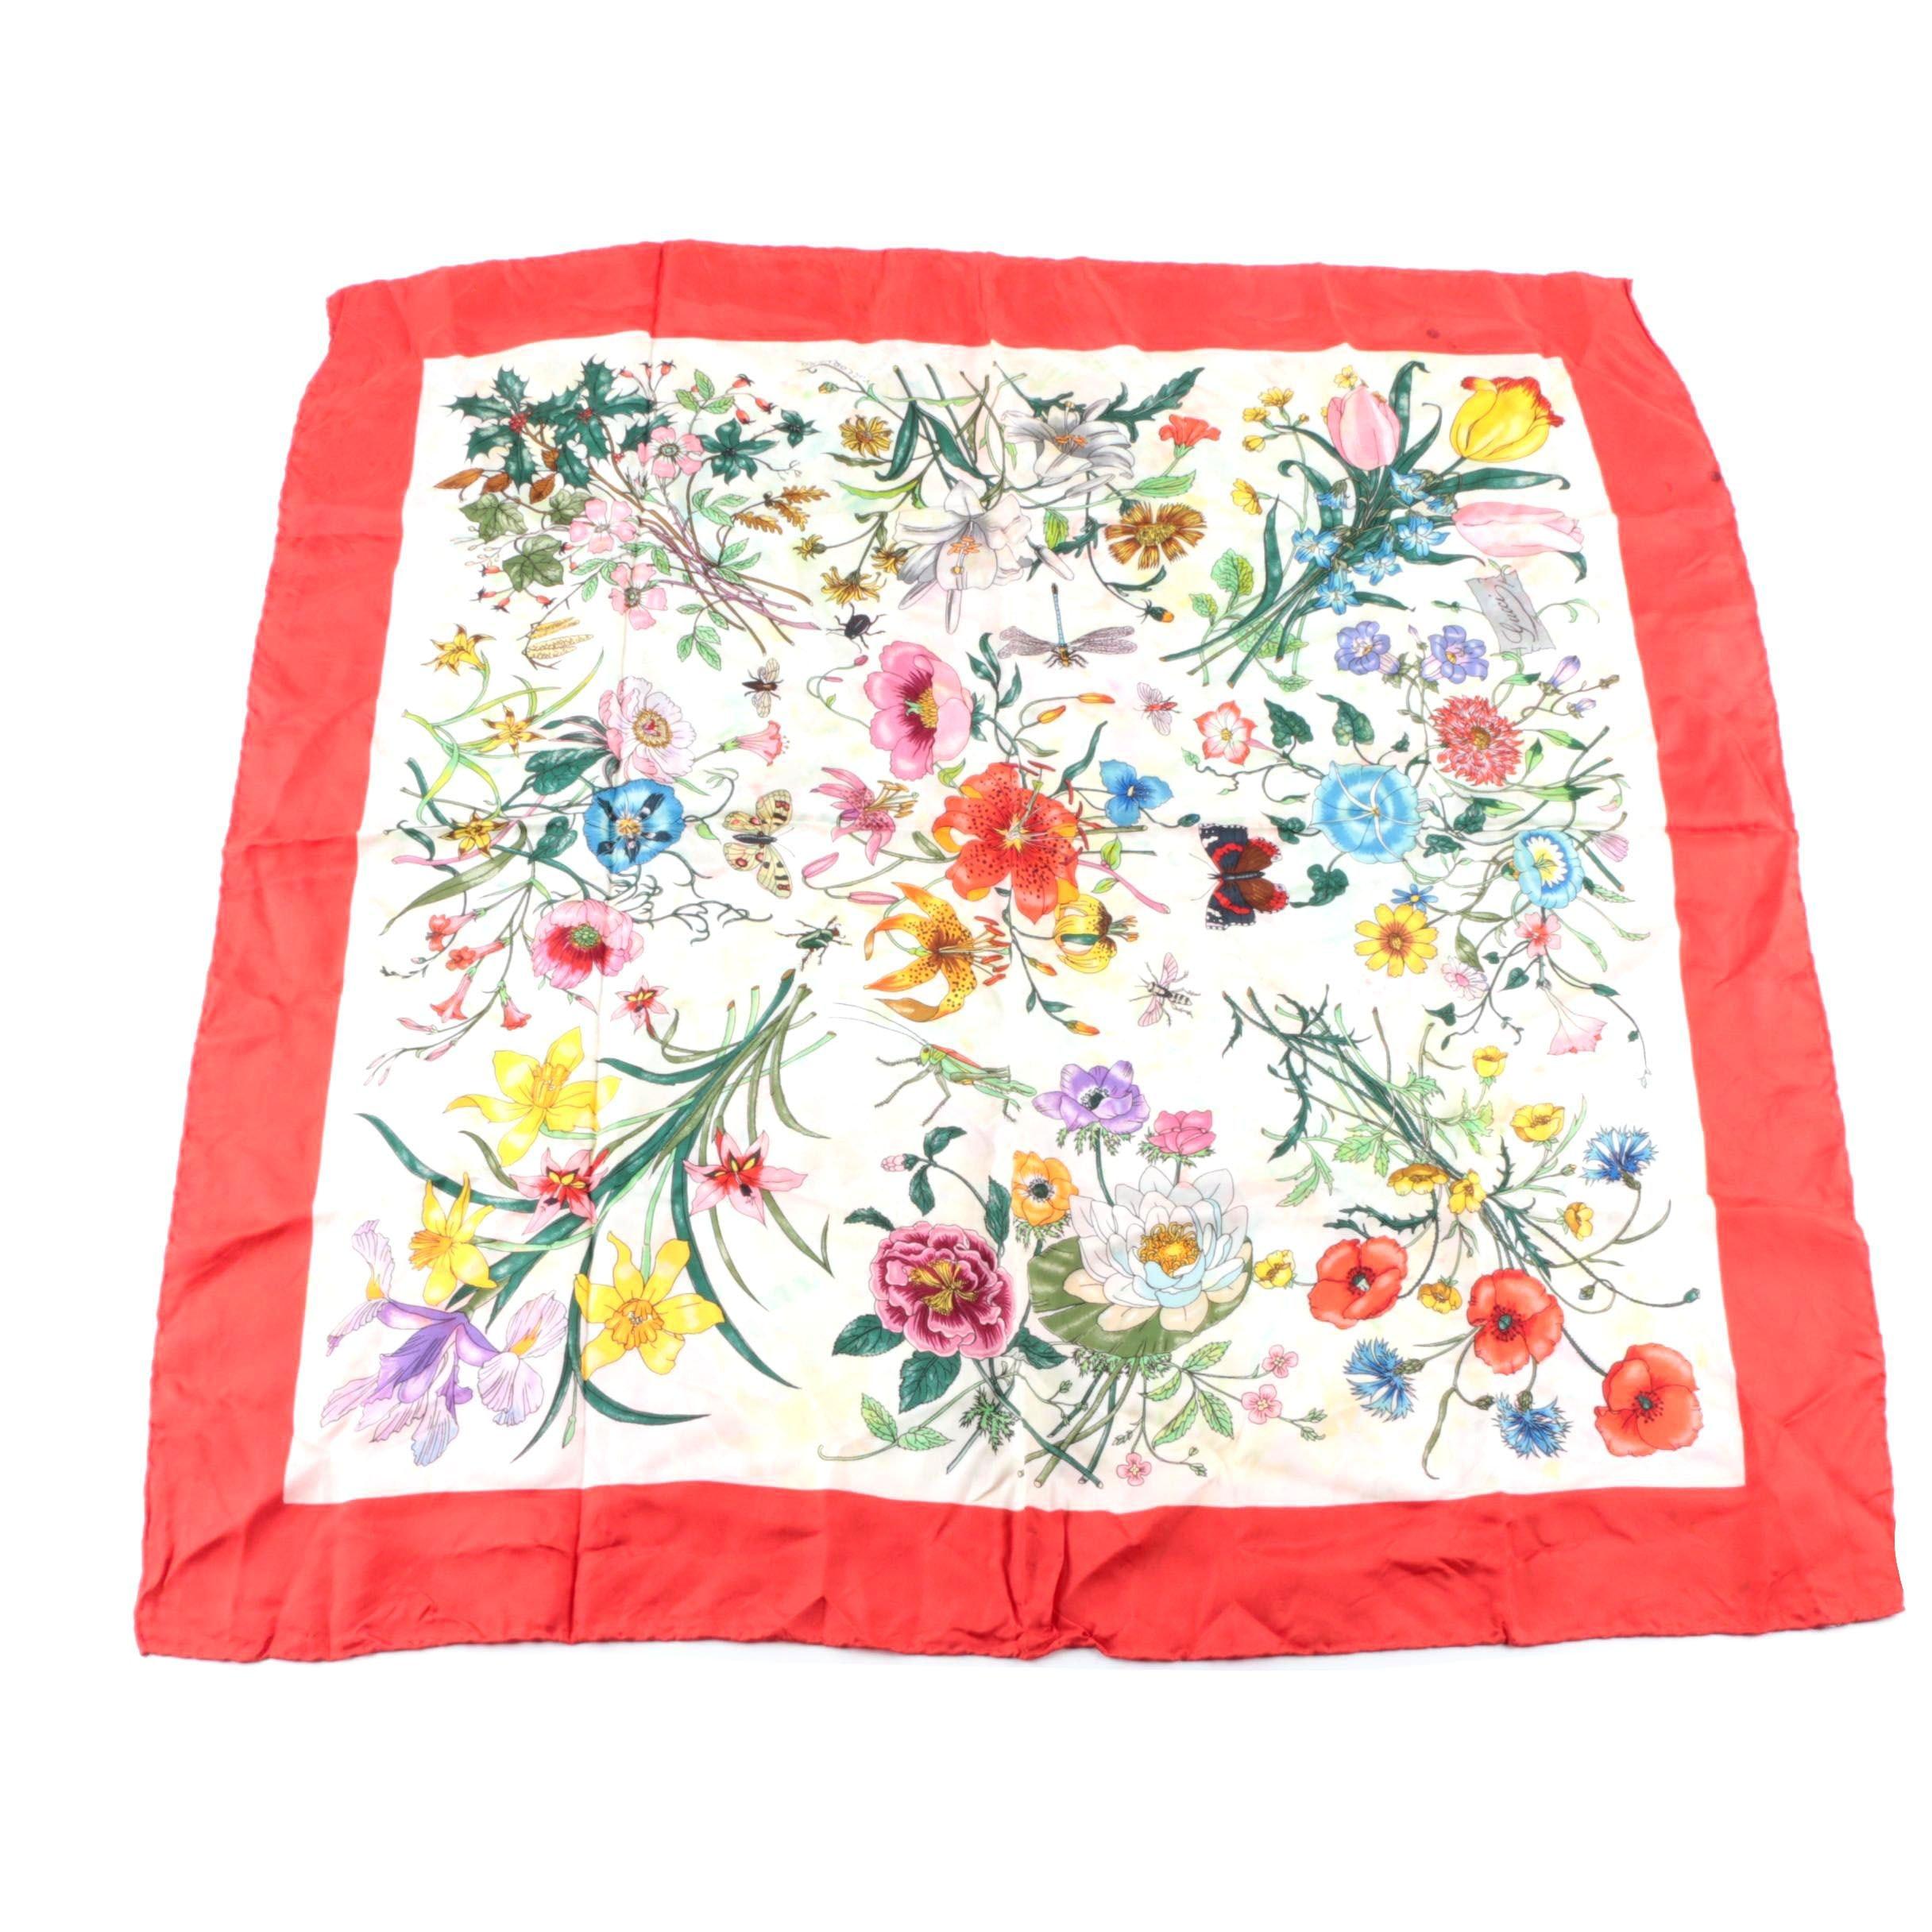 Vintage Gucci Floral Flora Silk Scarf